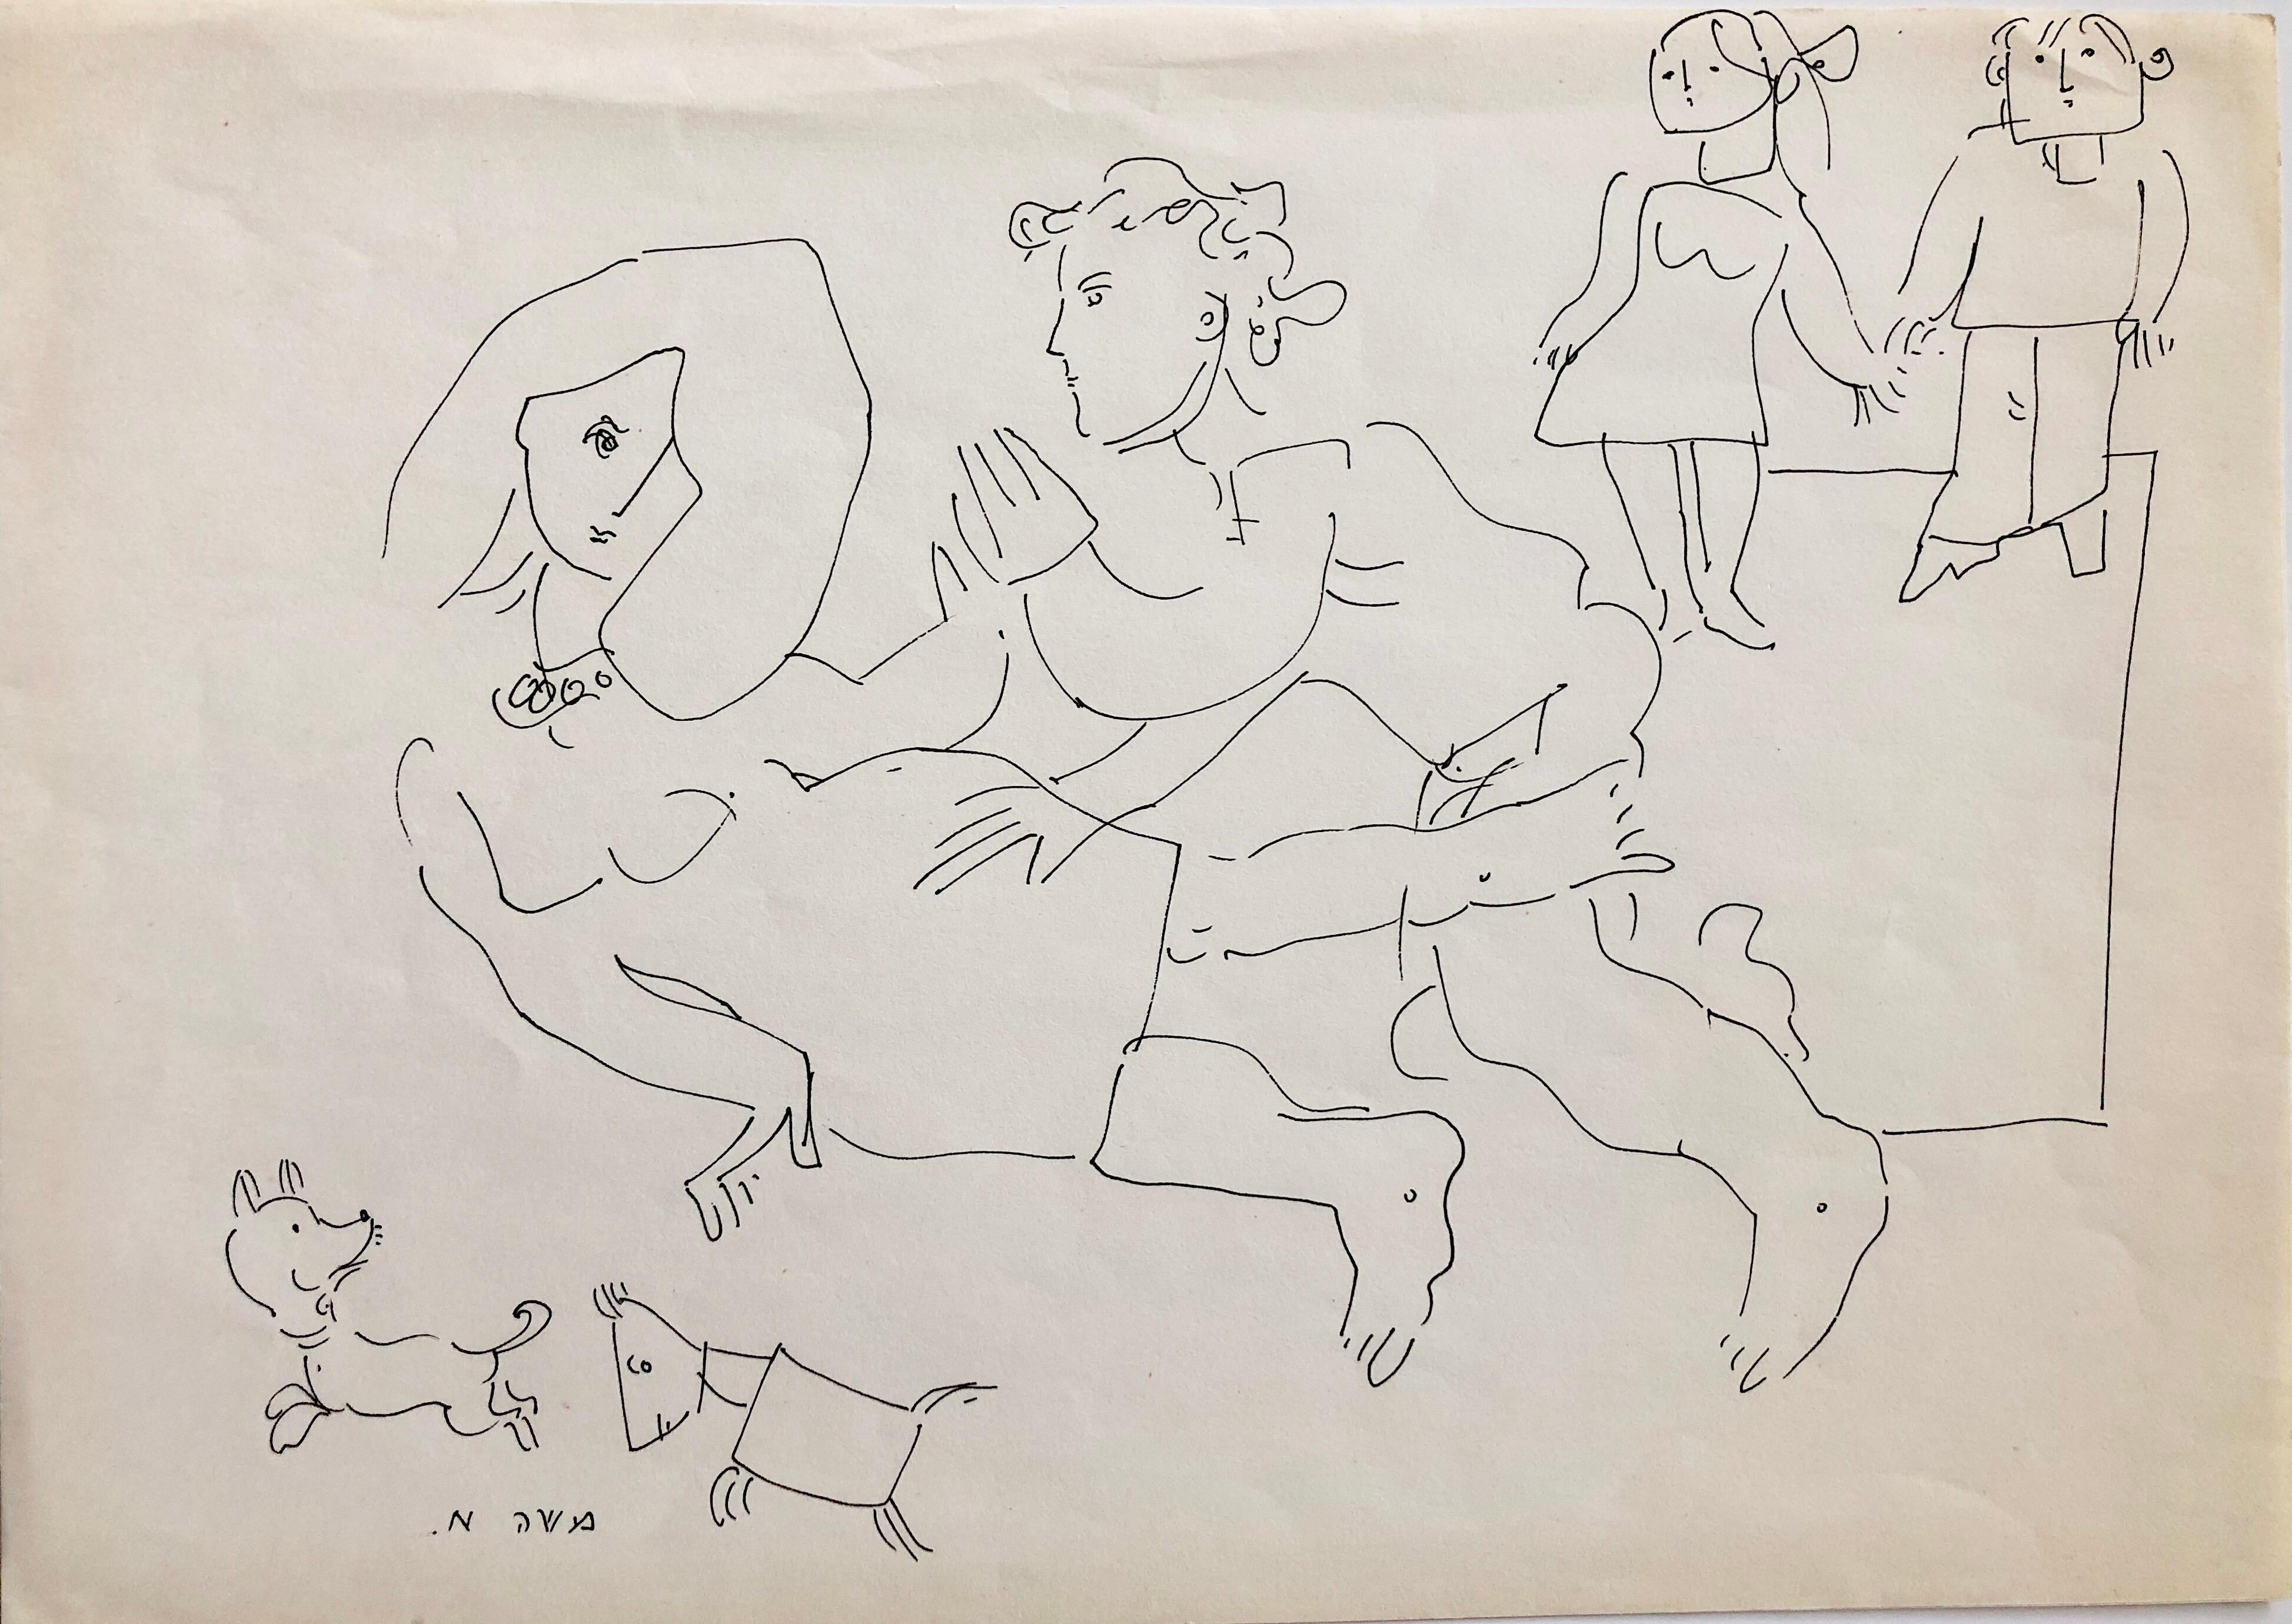 Vintage Israeli Bezalel School Drawing Family Playing, Dogs Puppies Kibbutz Life